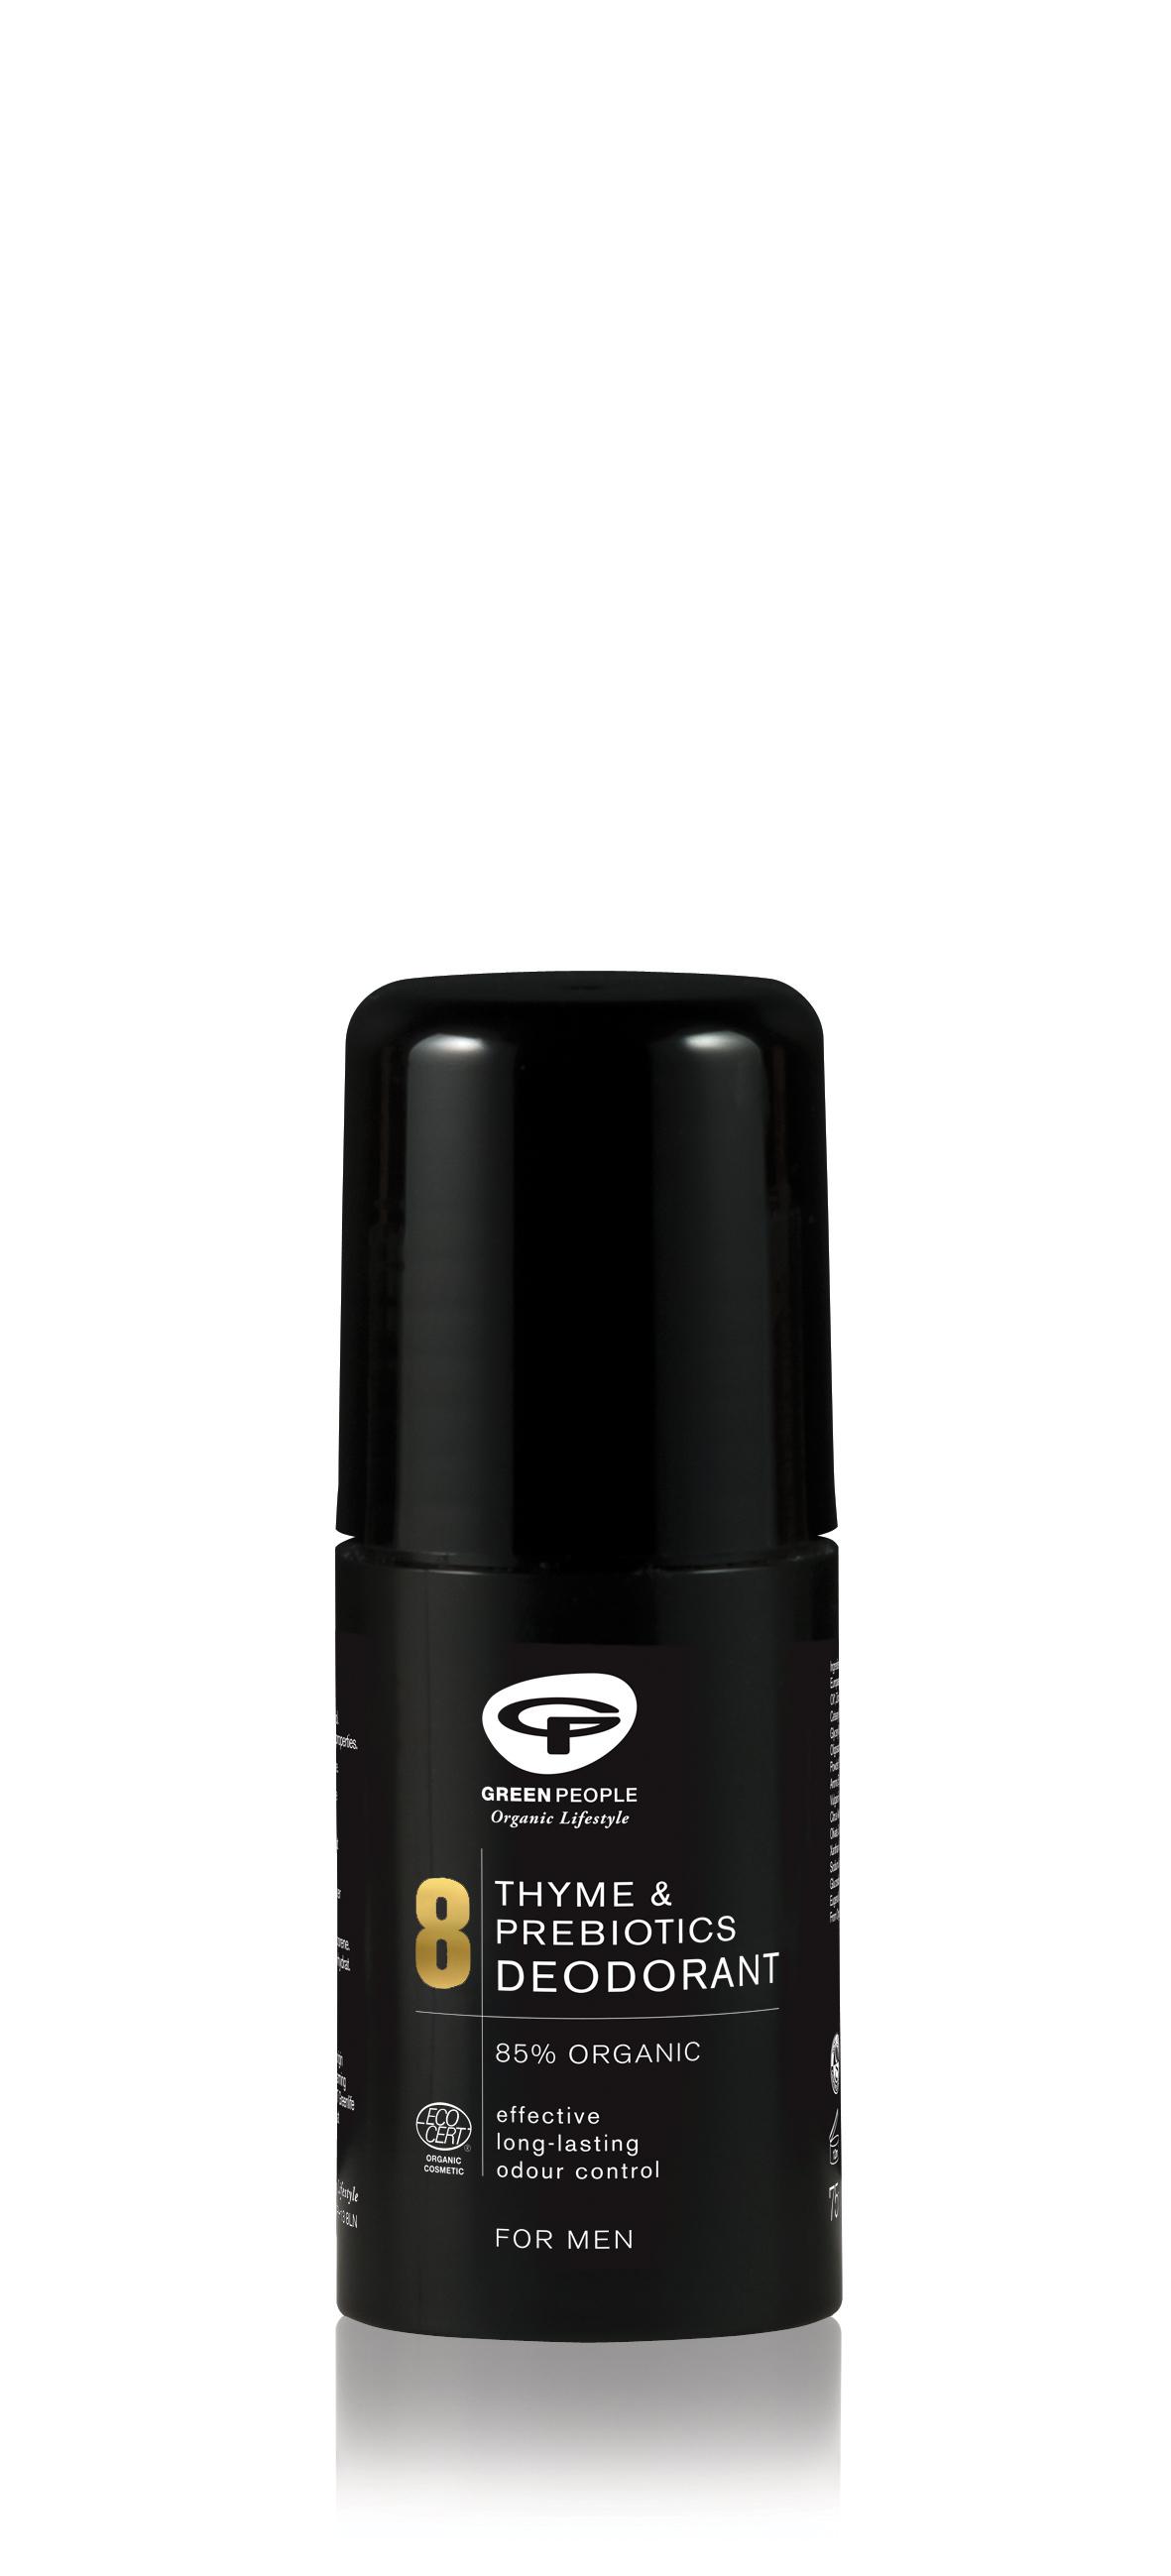 Thyme & Prebiotics Deodorant For Men 75ml